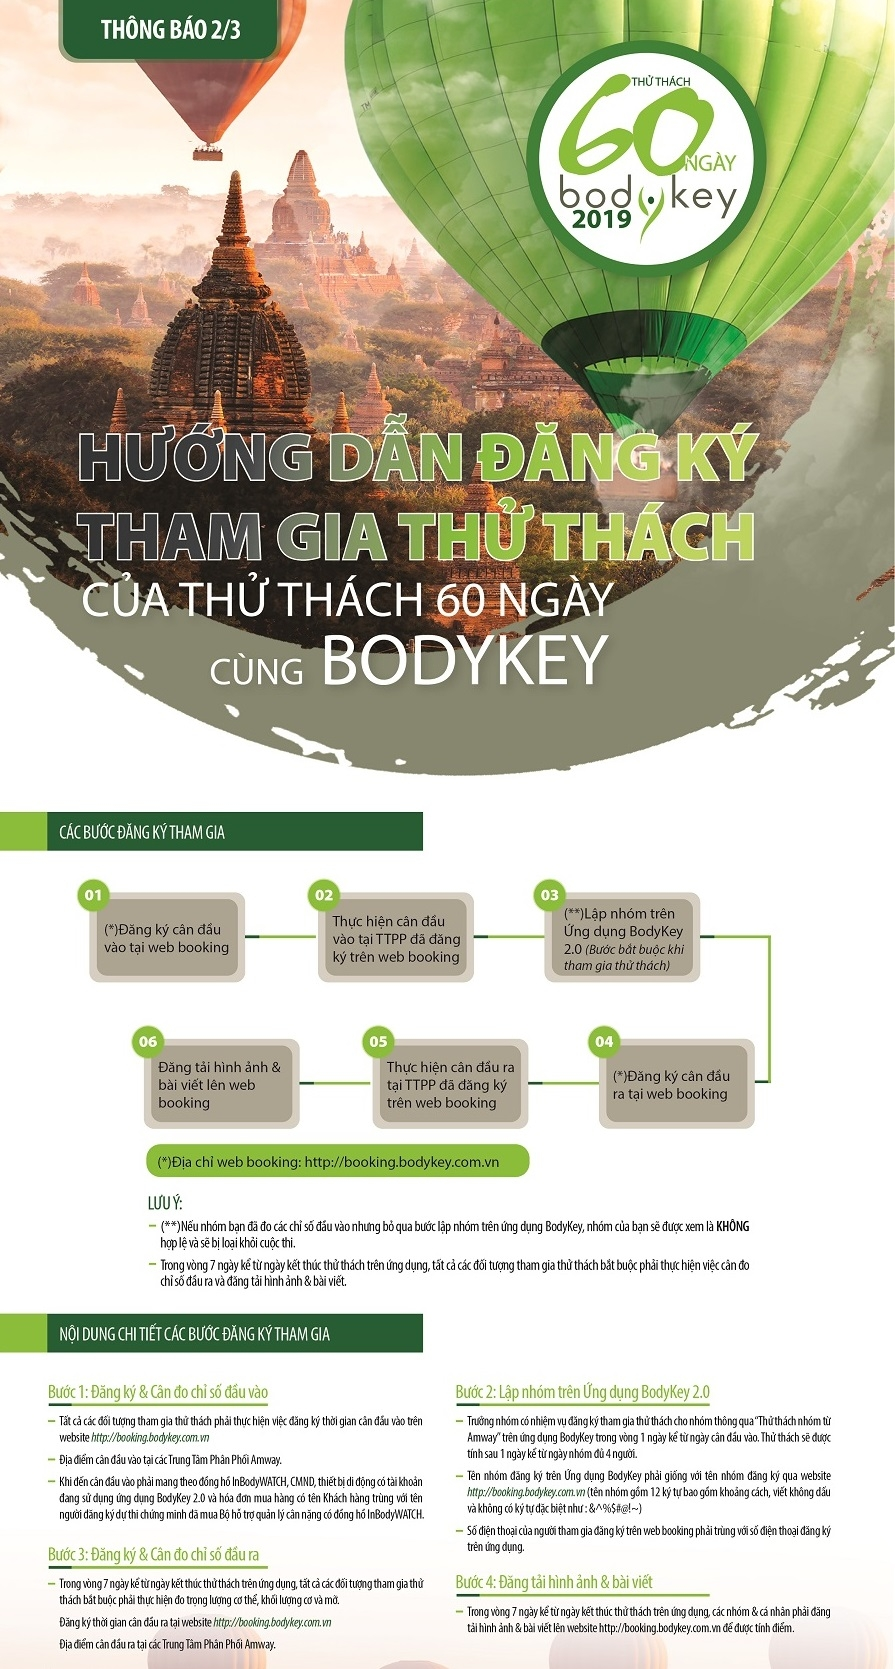 TB_2_BDK_Huong_dan_dang_ky_thu_thach.jpg